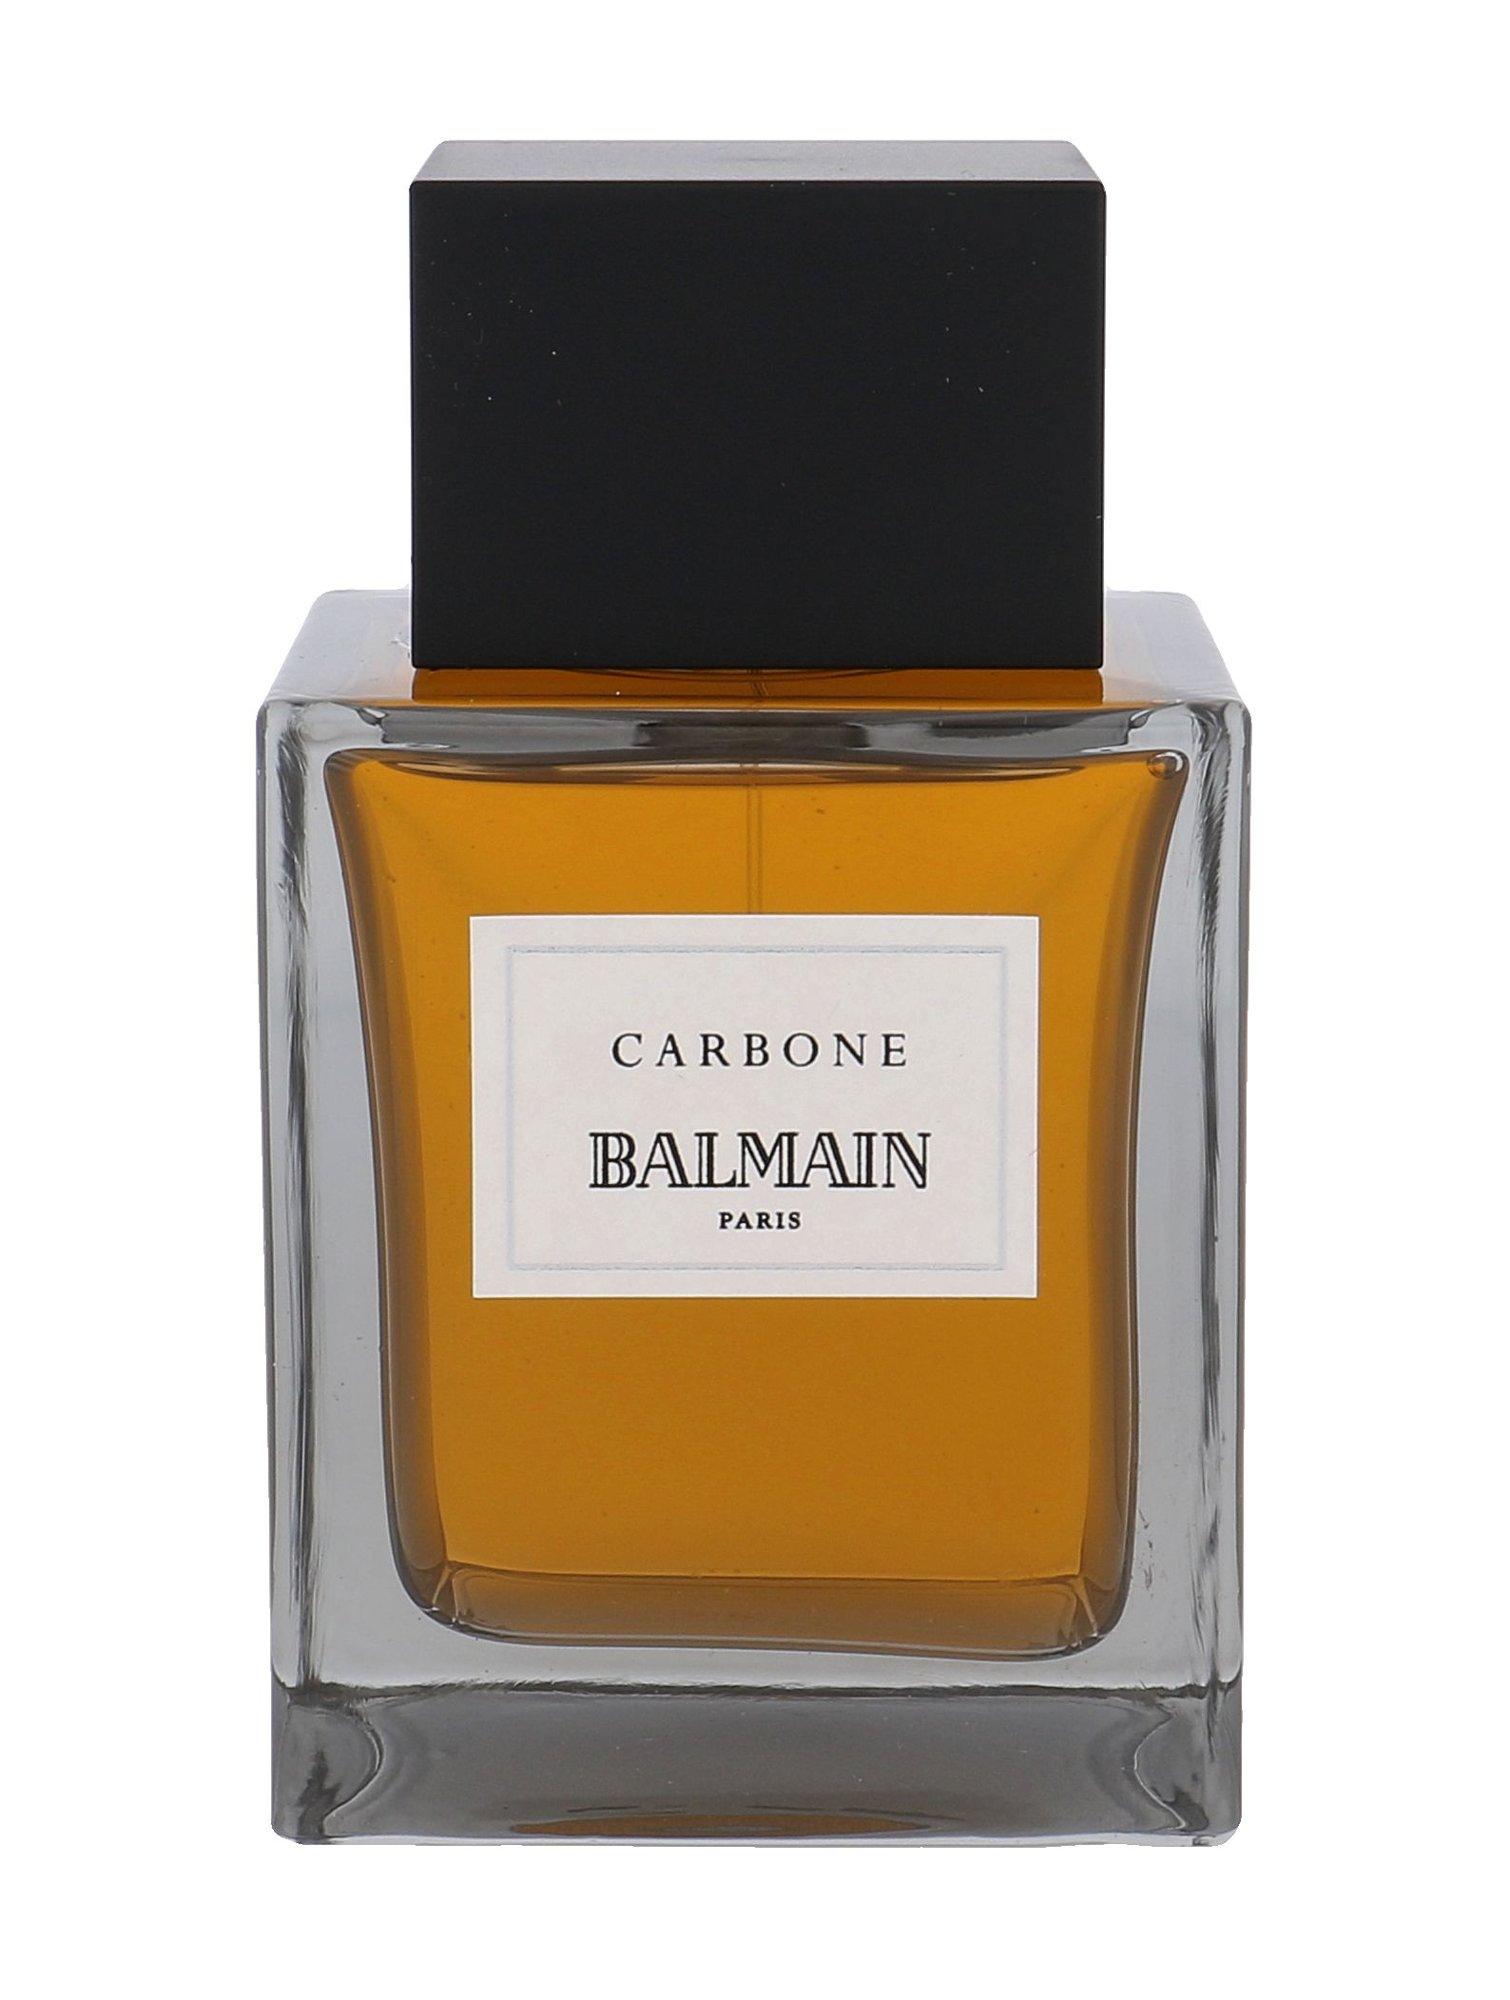 Balmain Carbone EDT 100ml